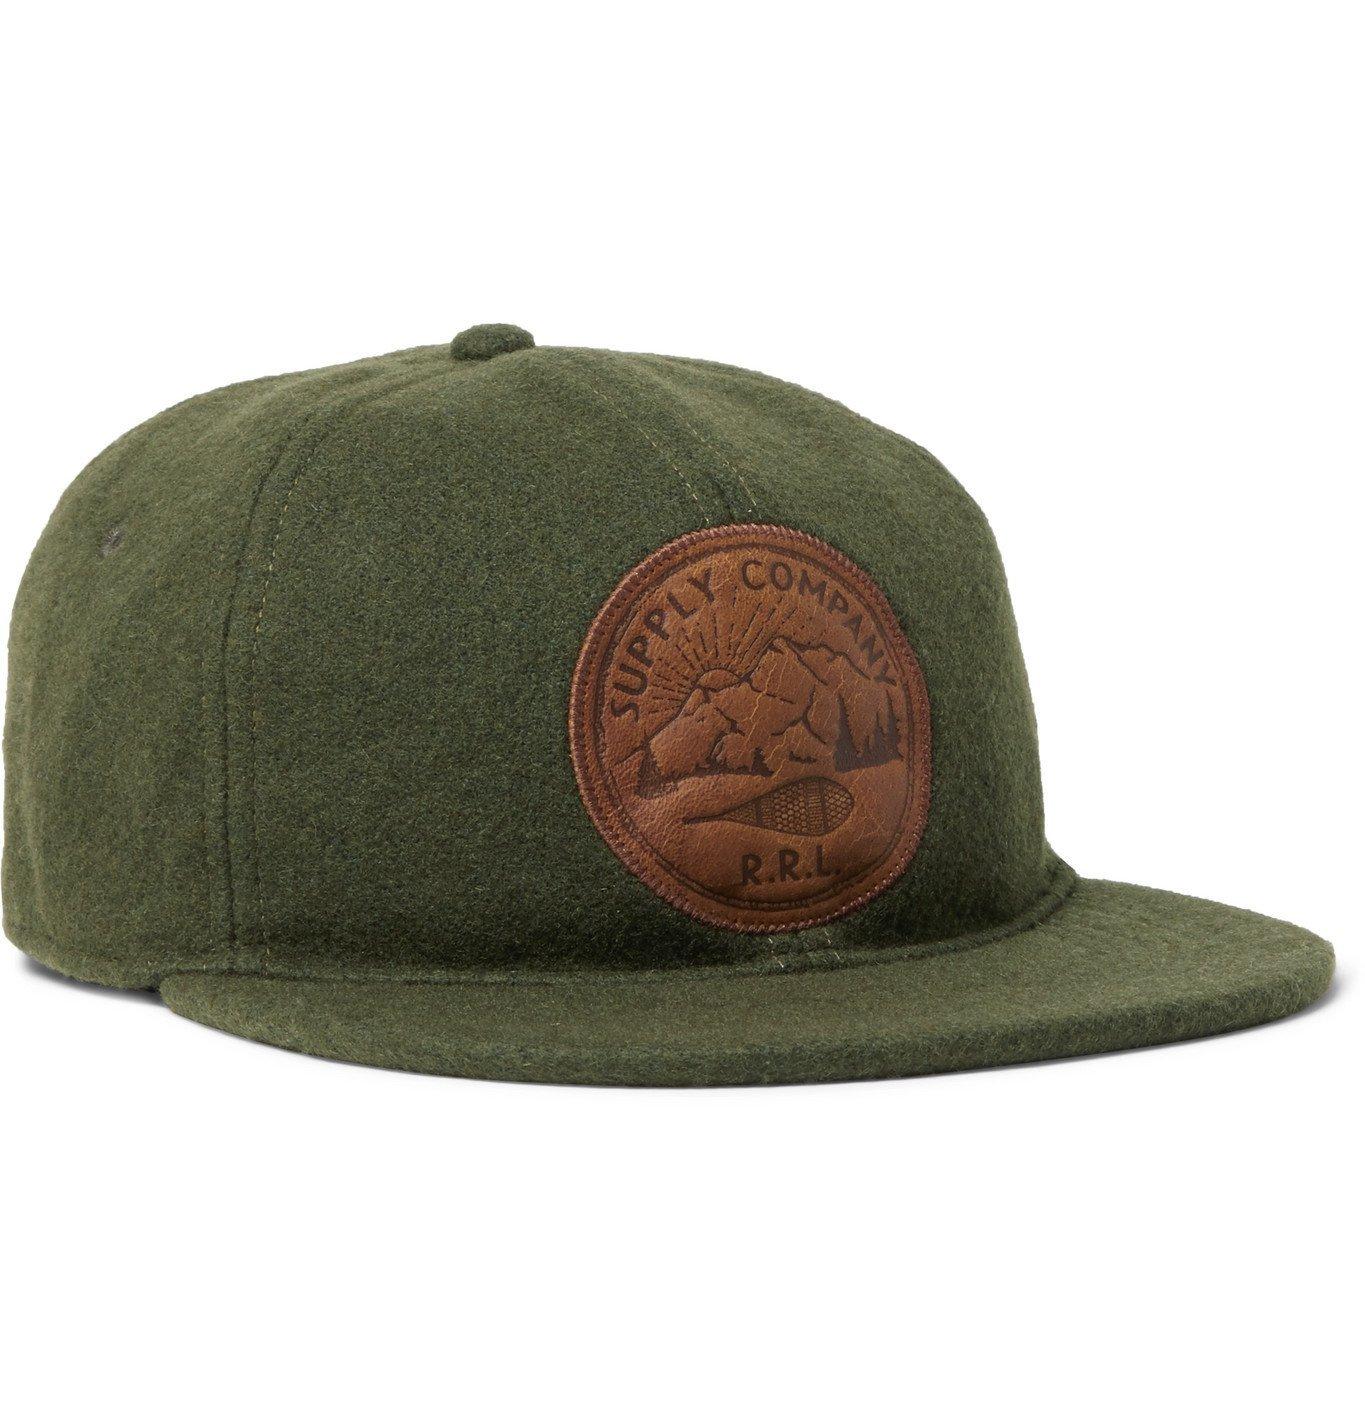 RRL - Appliquéd Wool-Blend Baseball Cap - Green